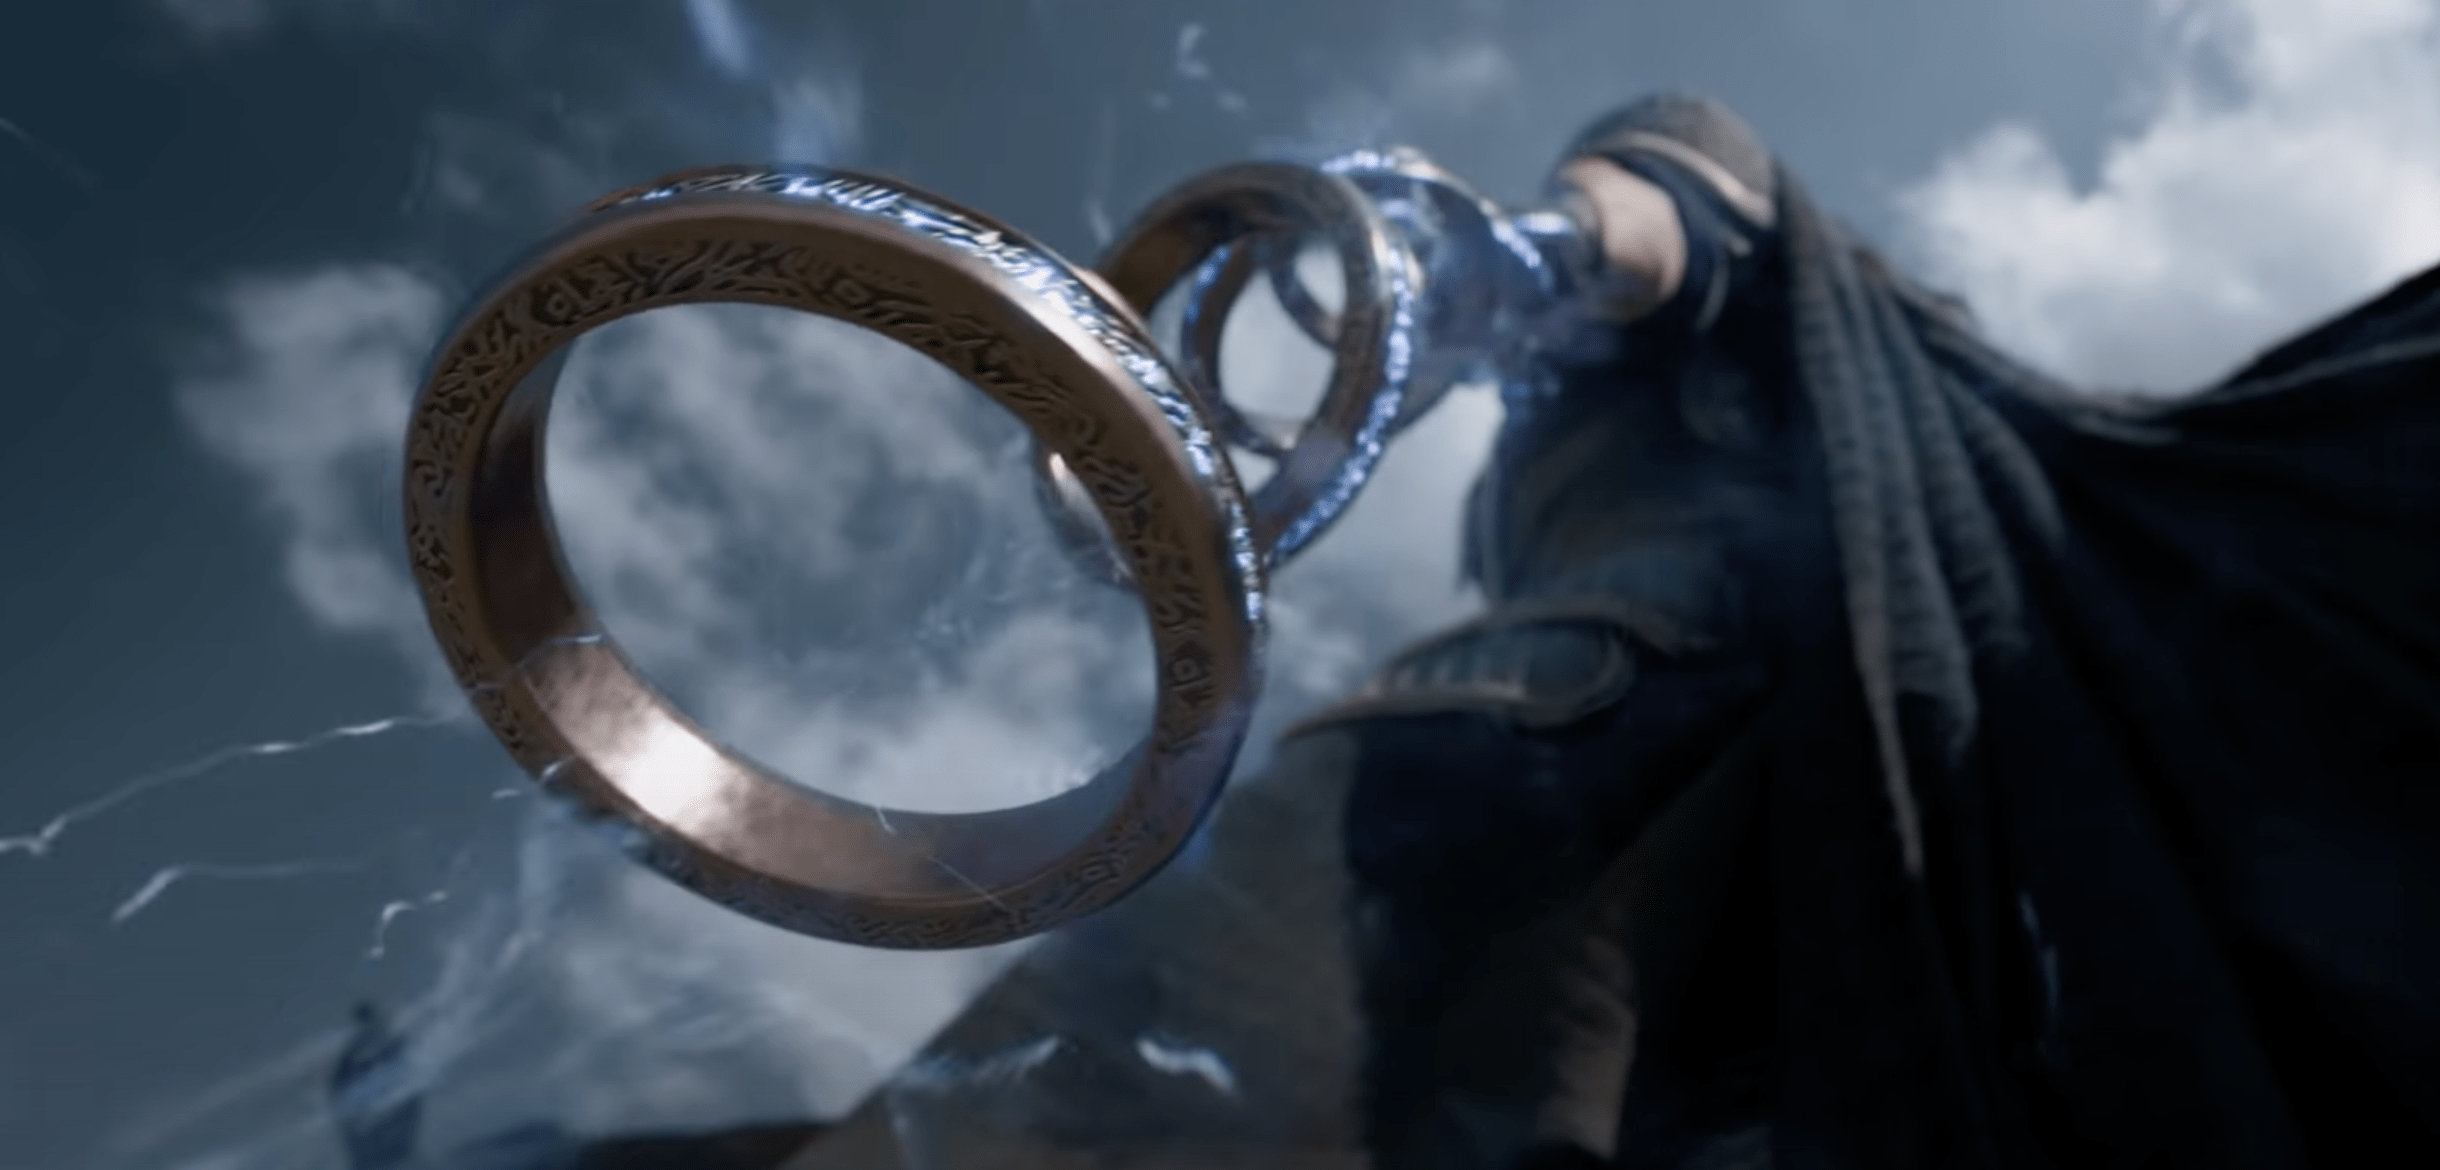 shang-chi trailer 2 ten rings